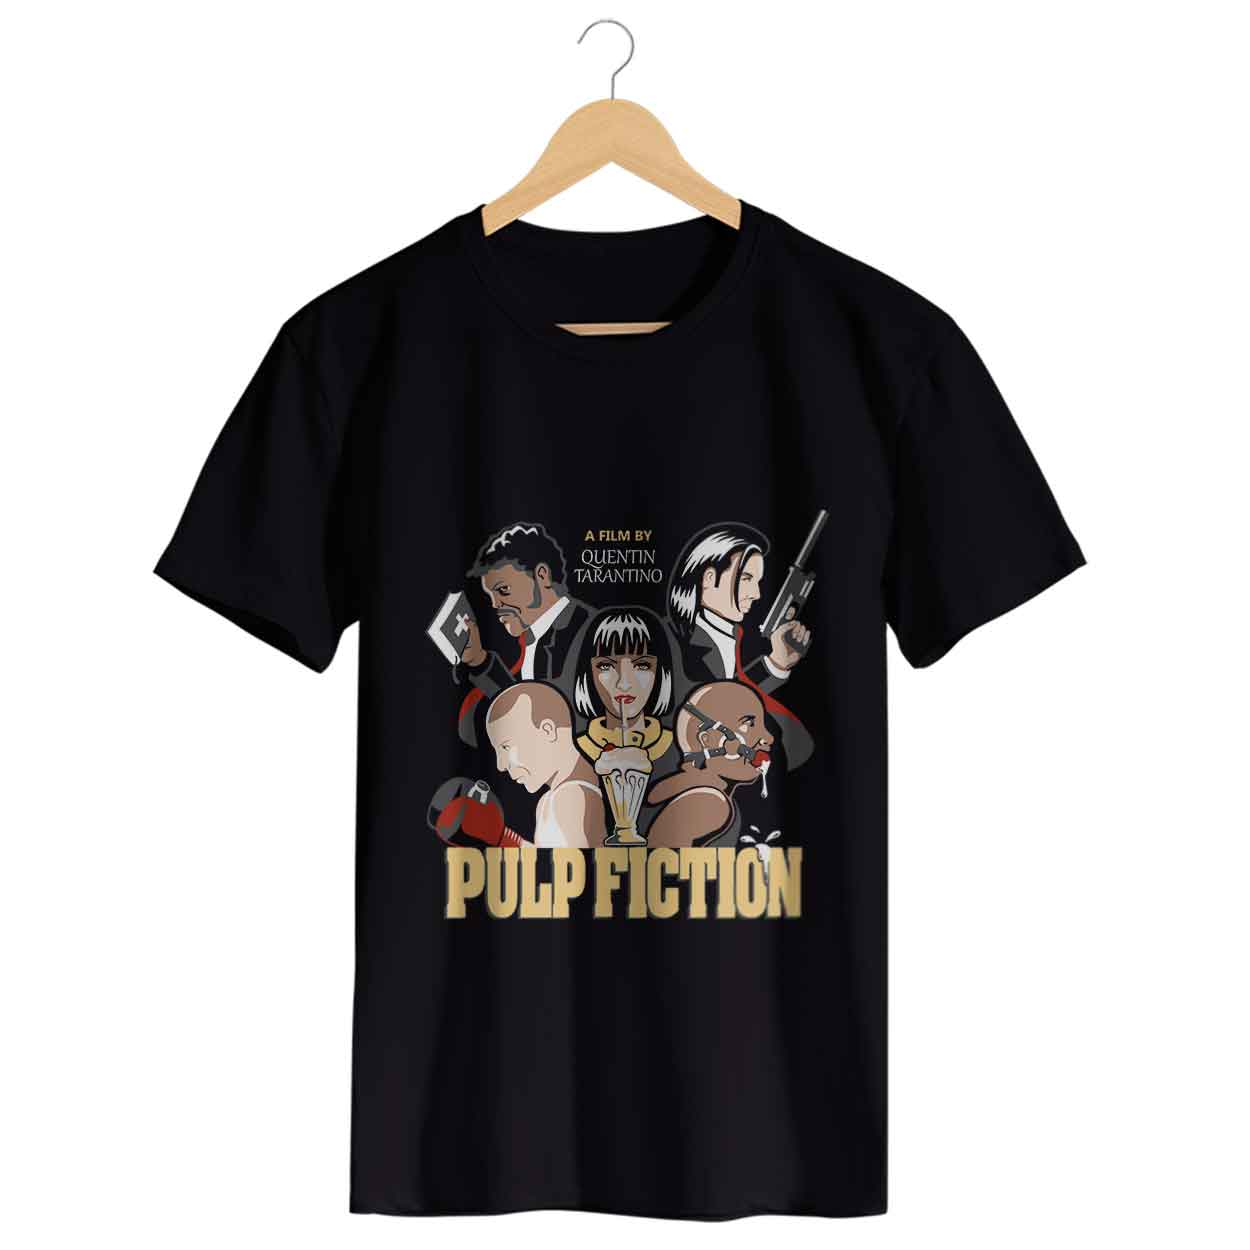 Camiseta - Pulp Fiction - Quentin Tarantino - Masculino